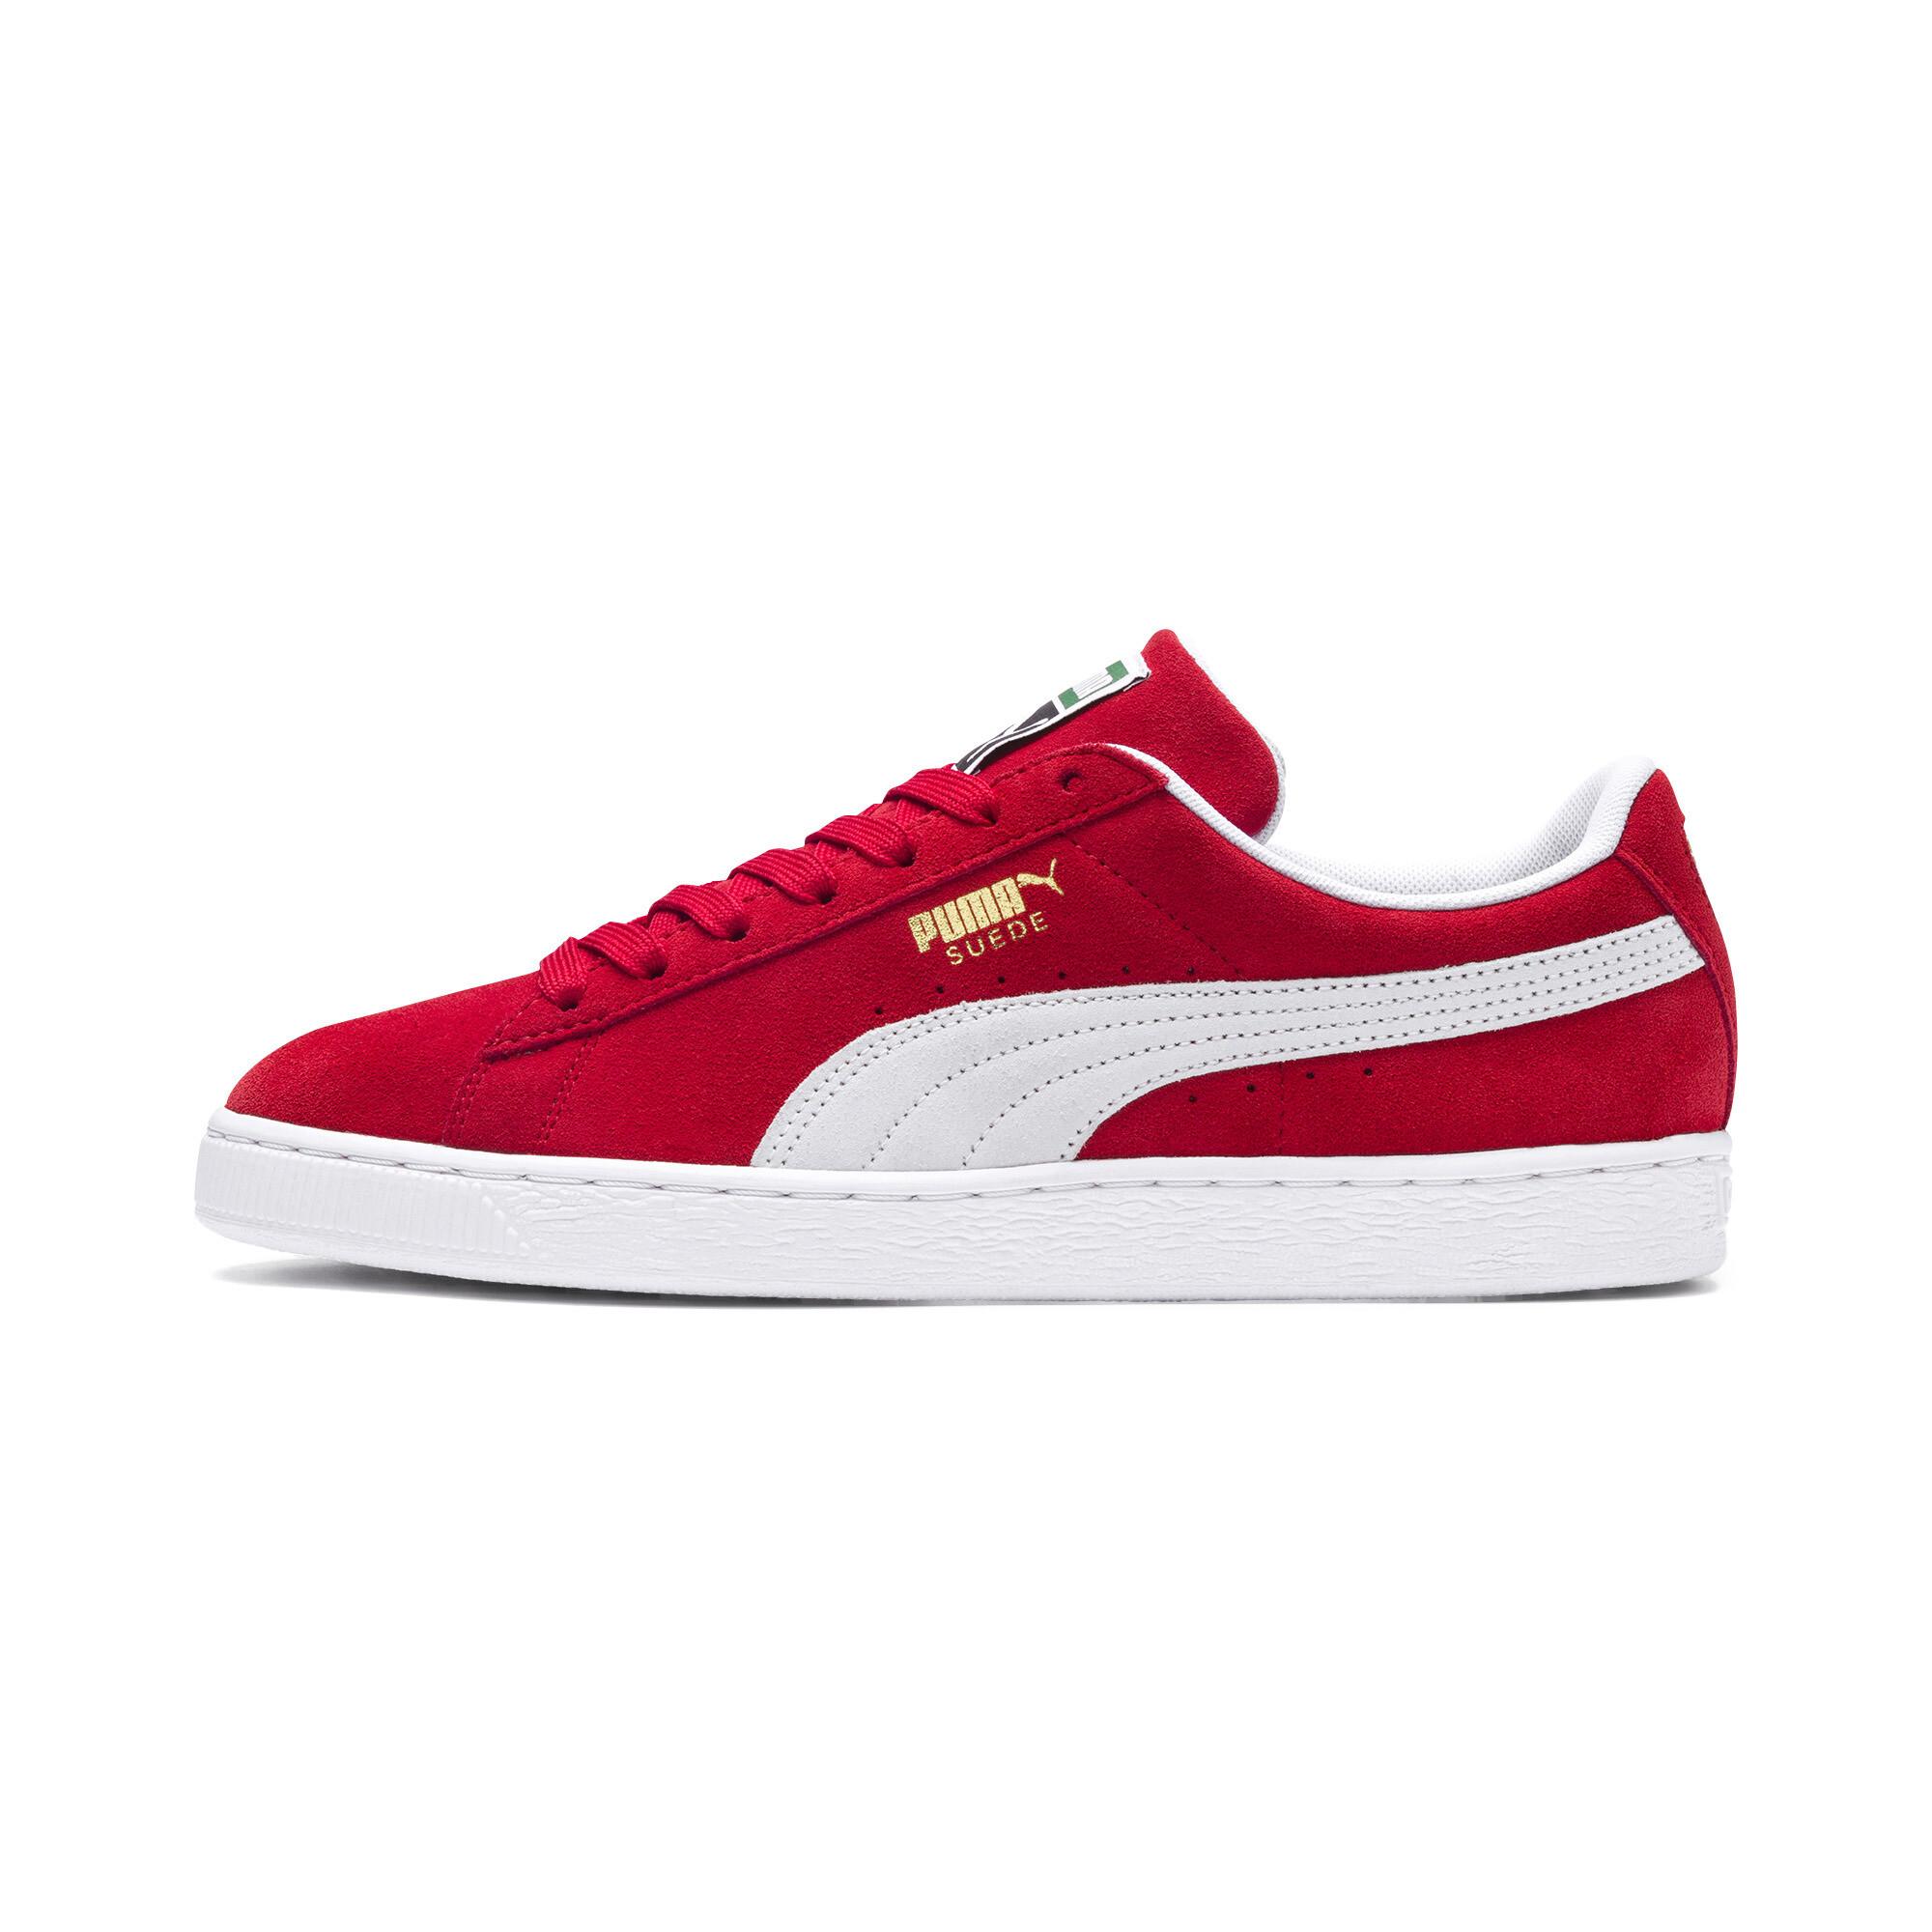 PUMA-Suede-Classic-Sneakers-Men-Shoe-Sport-Shoe thumbnail 16